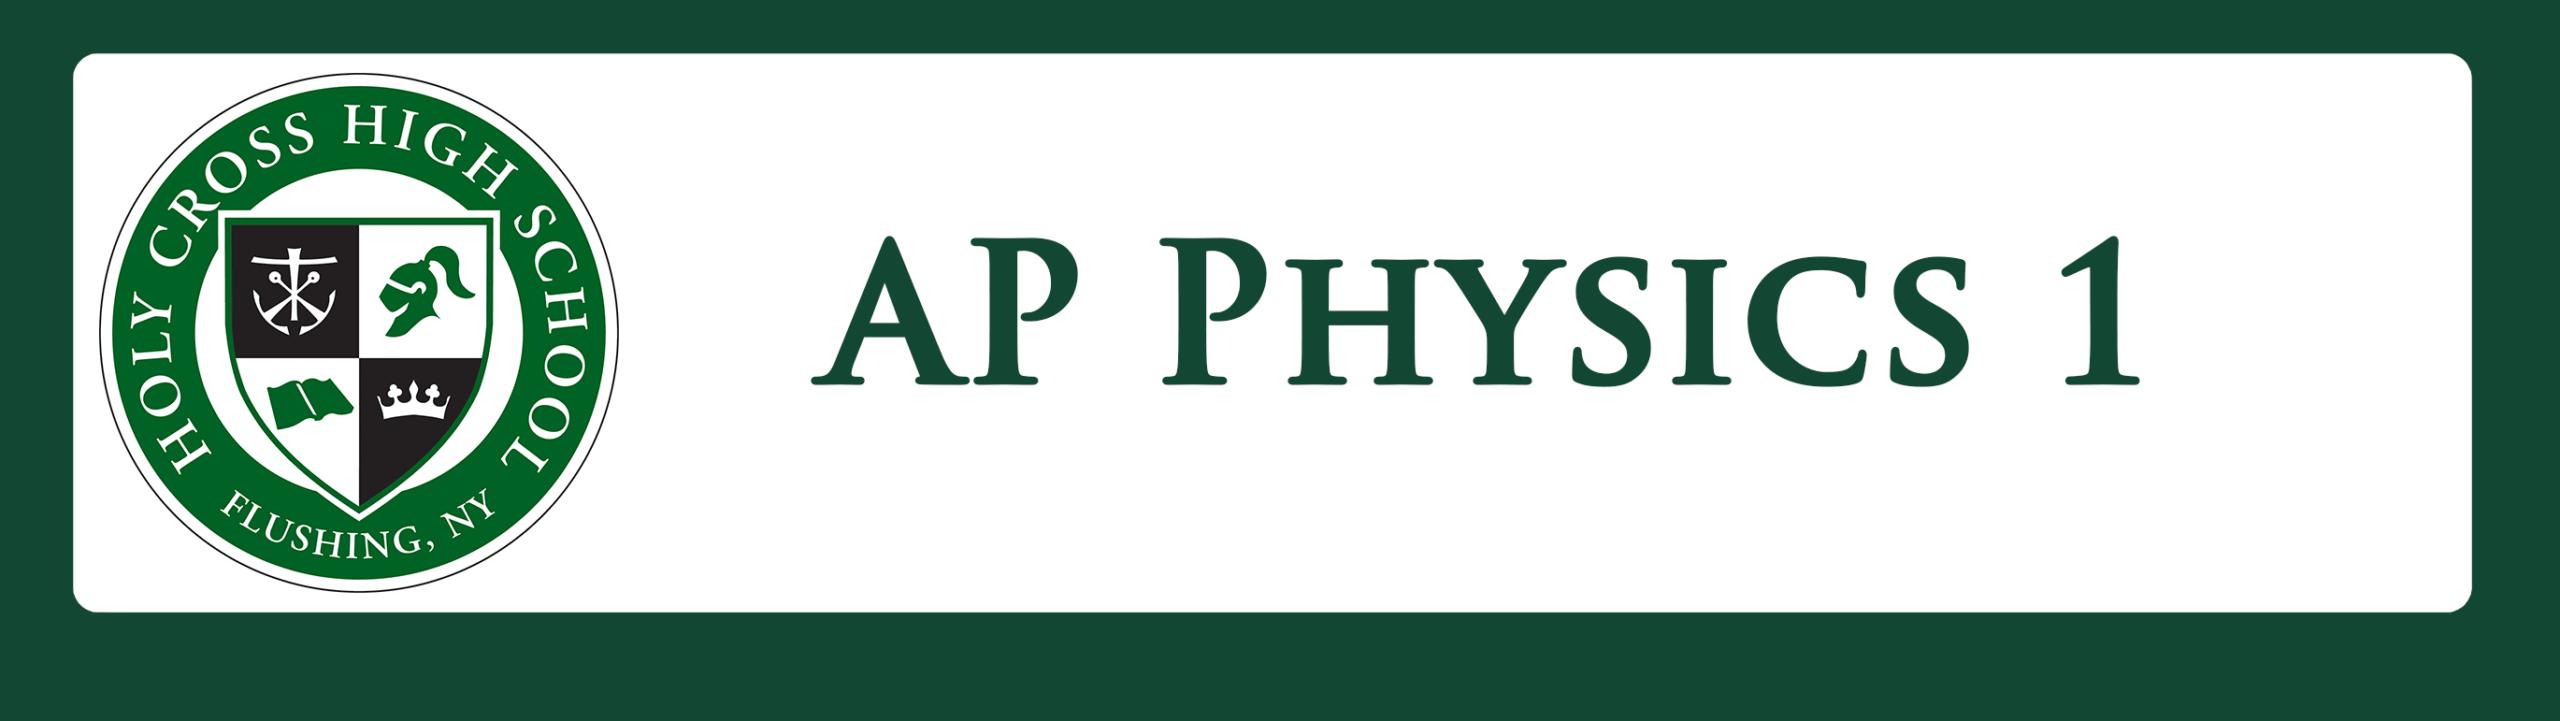 ap physics 1 | Holy Cross High School